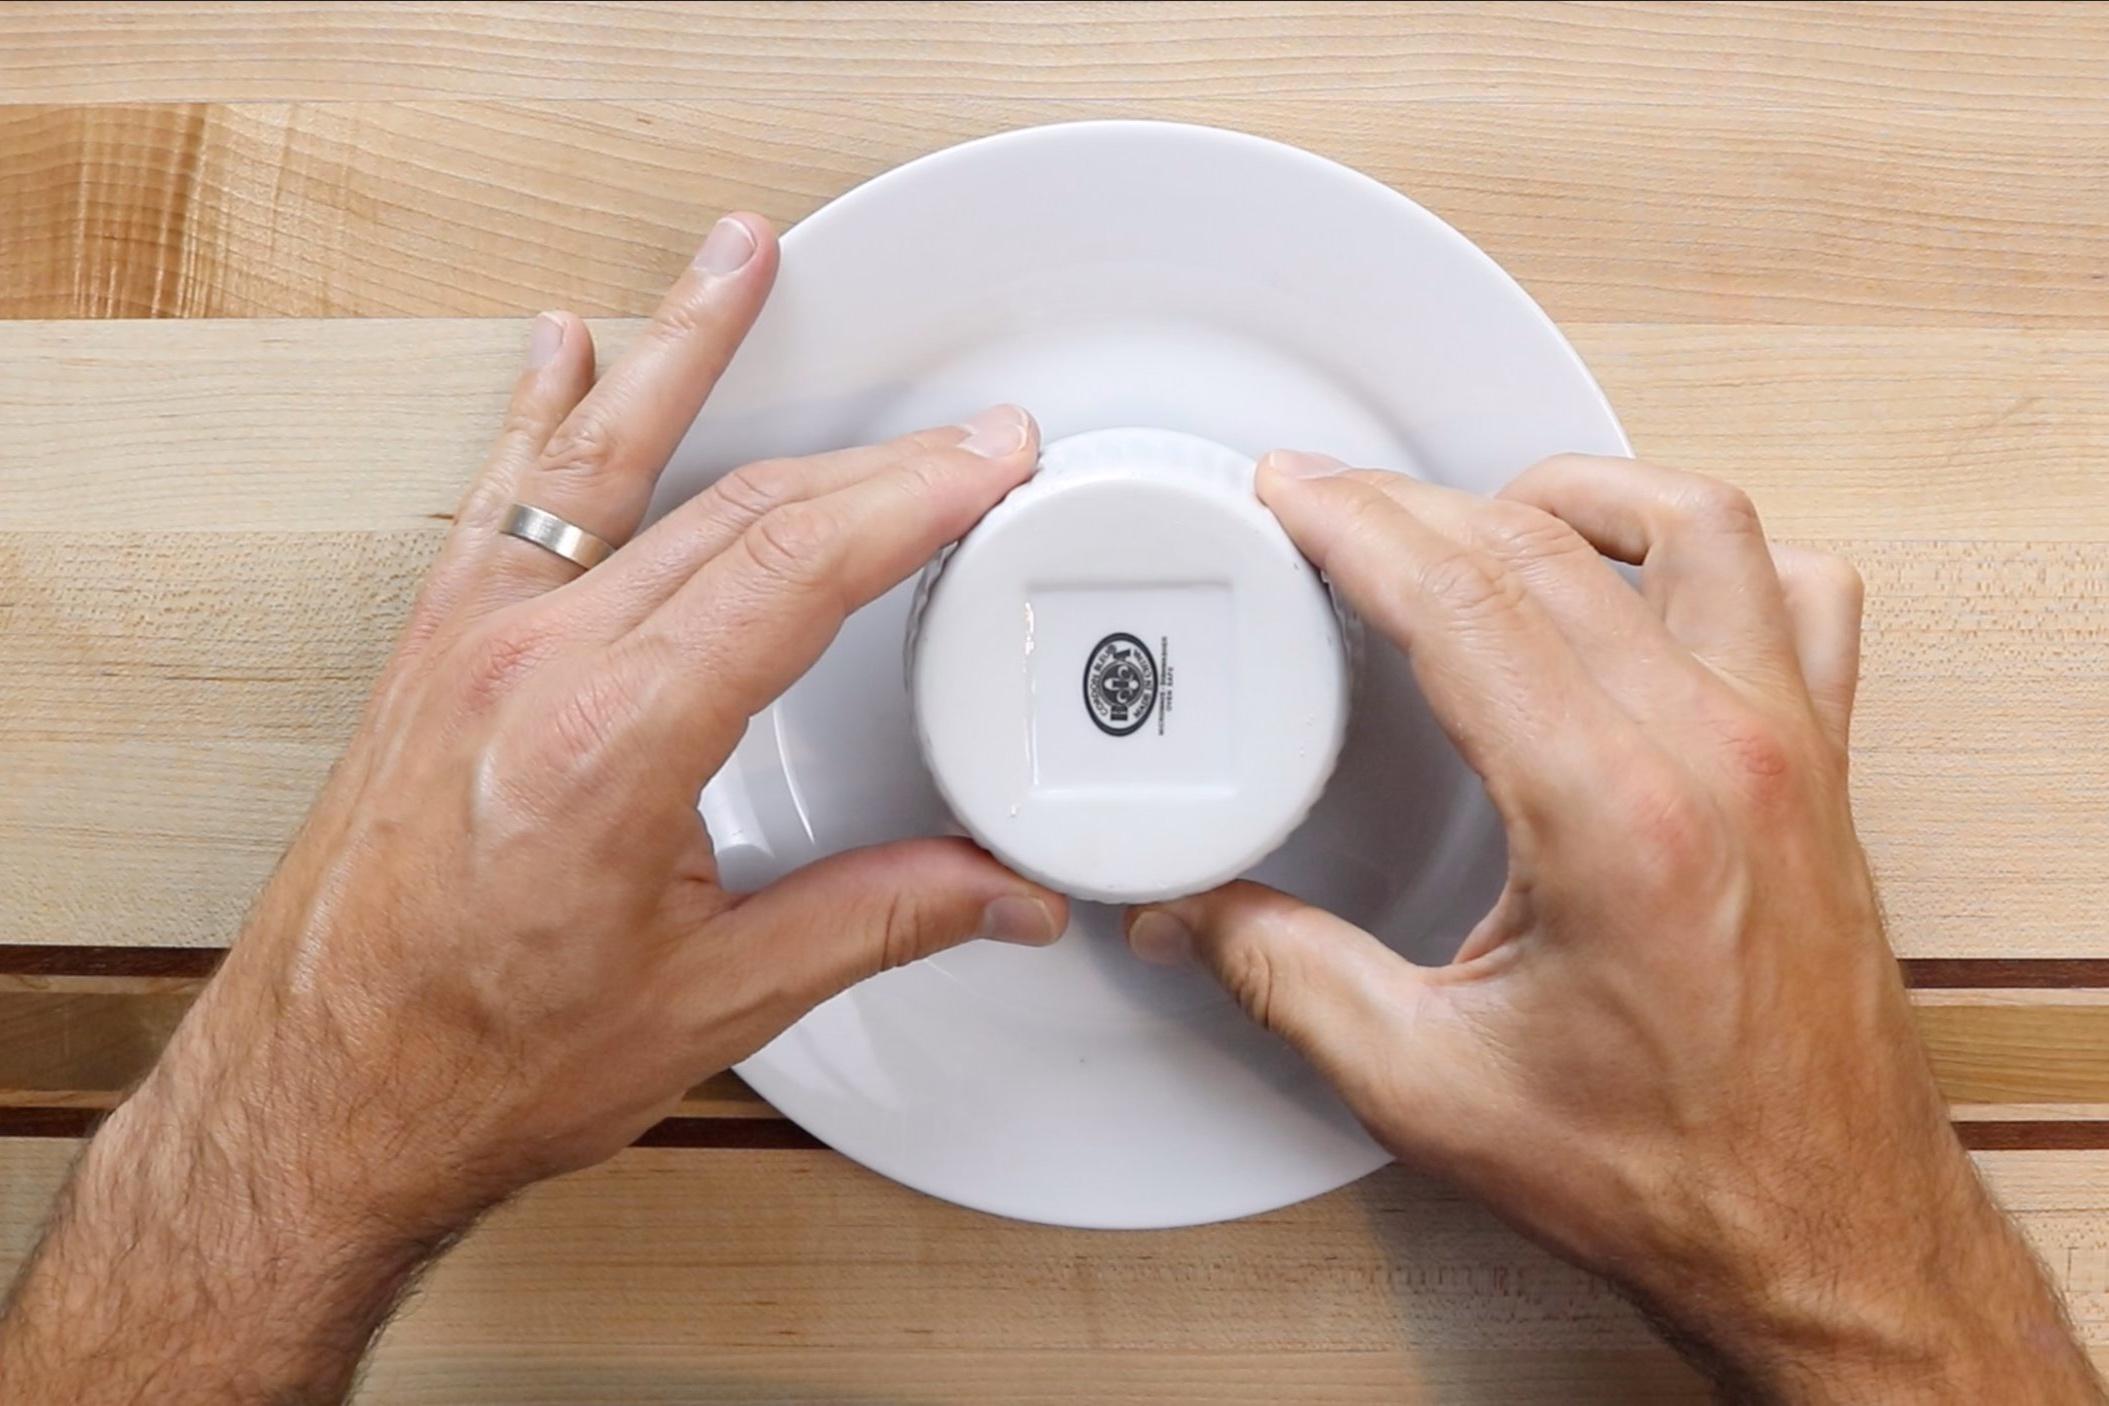 12. Run a knife around the edge of each ramekin and turn over onto a plate. -